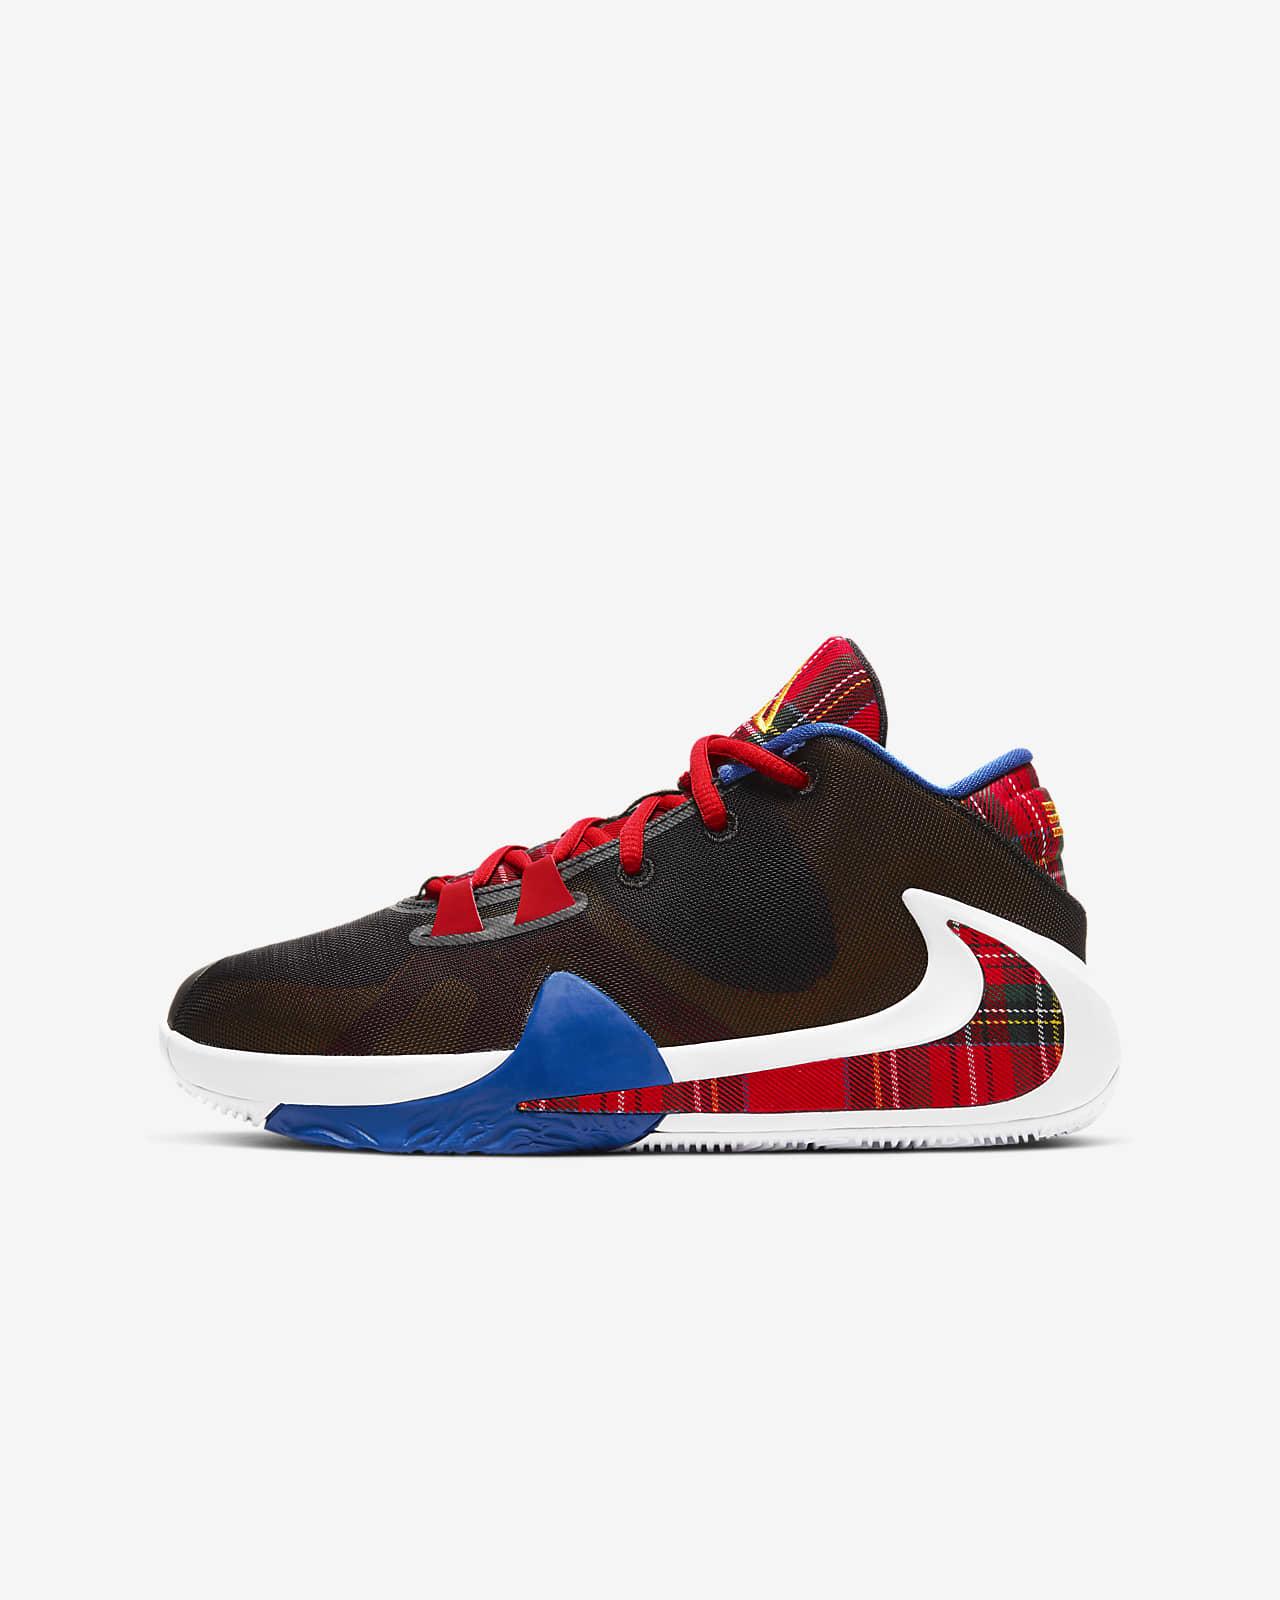 freak 1 shoes